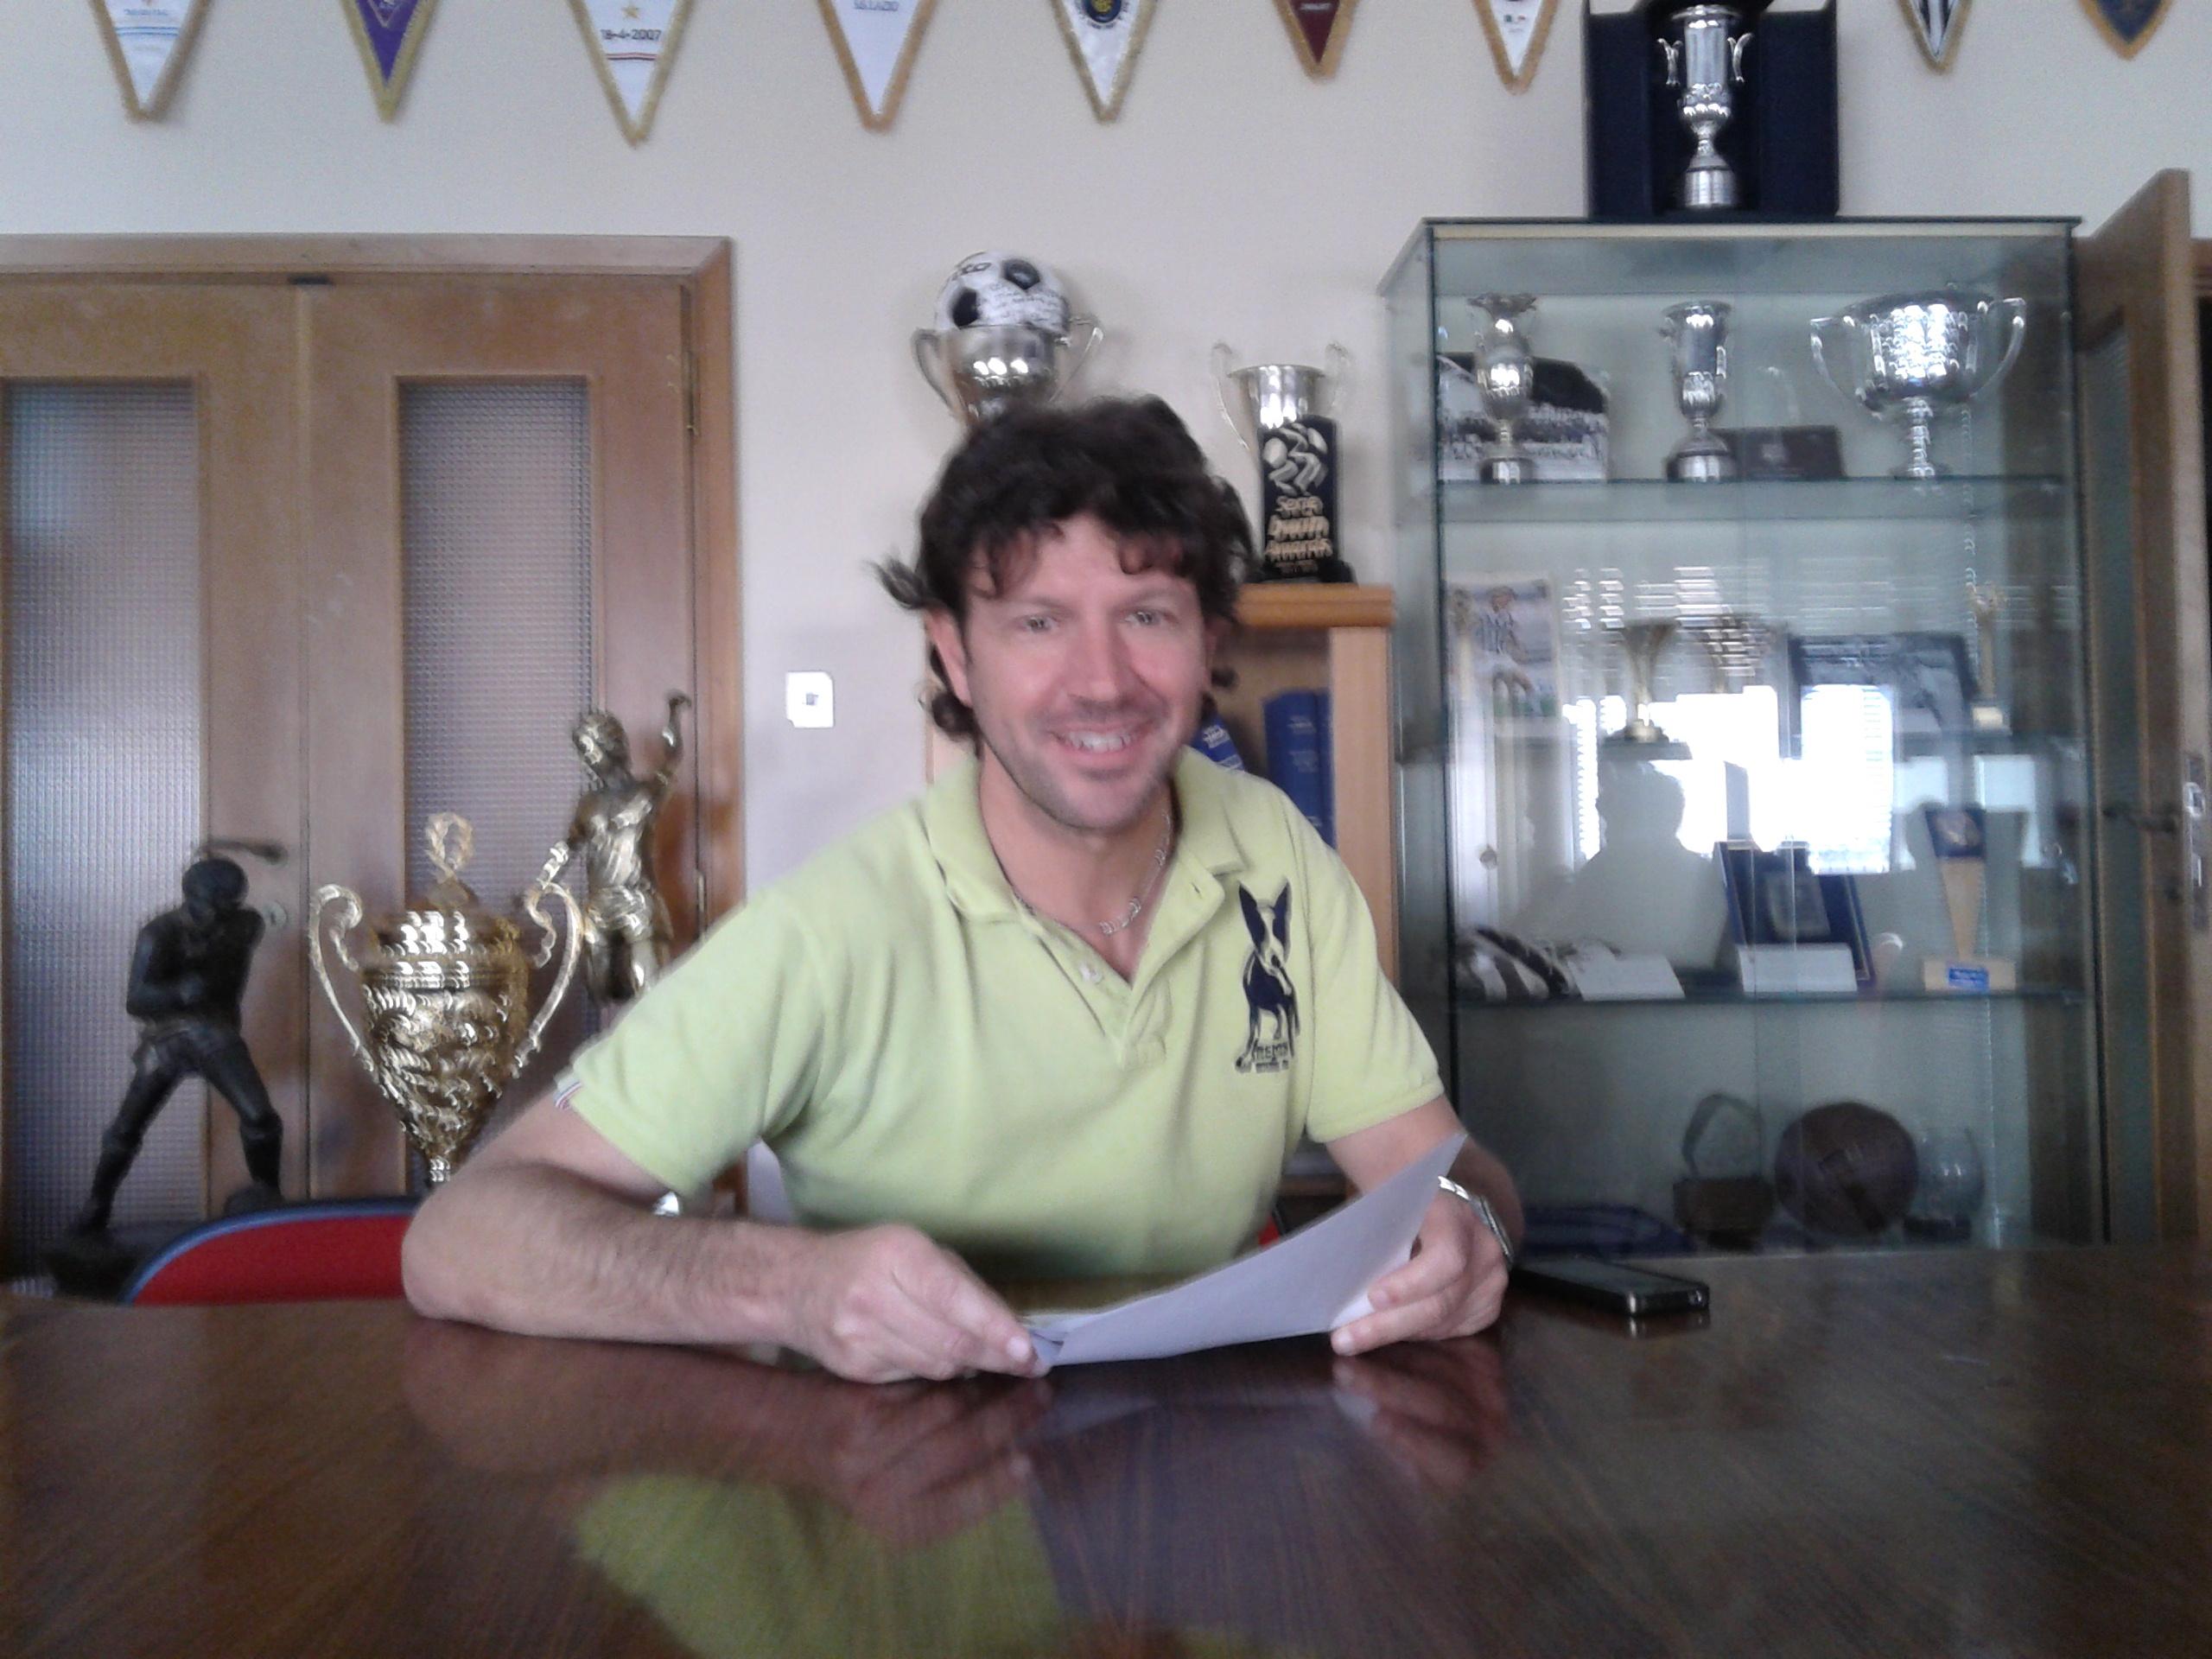 Paolo De Matteis, all'Ascoli dal 2005